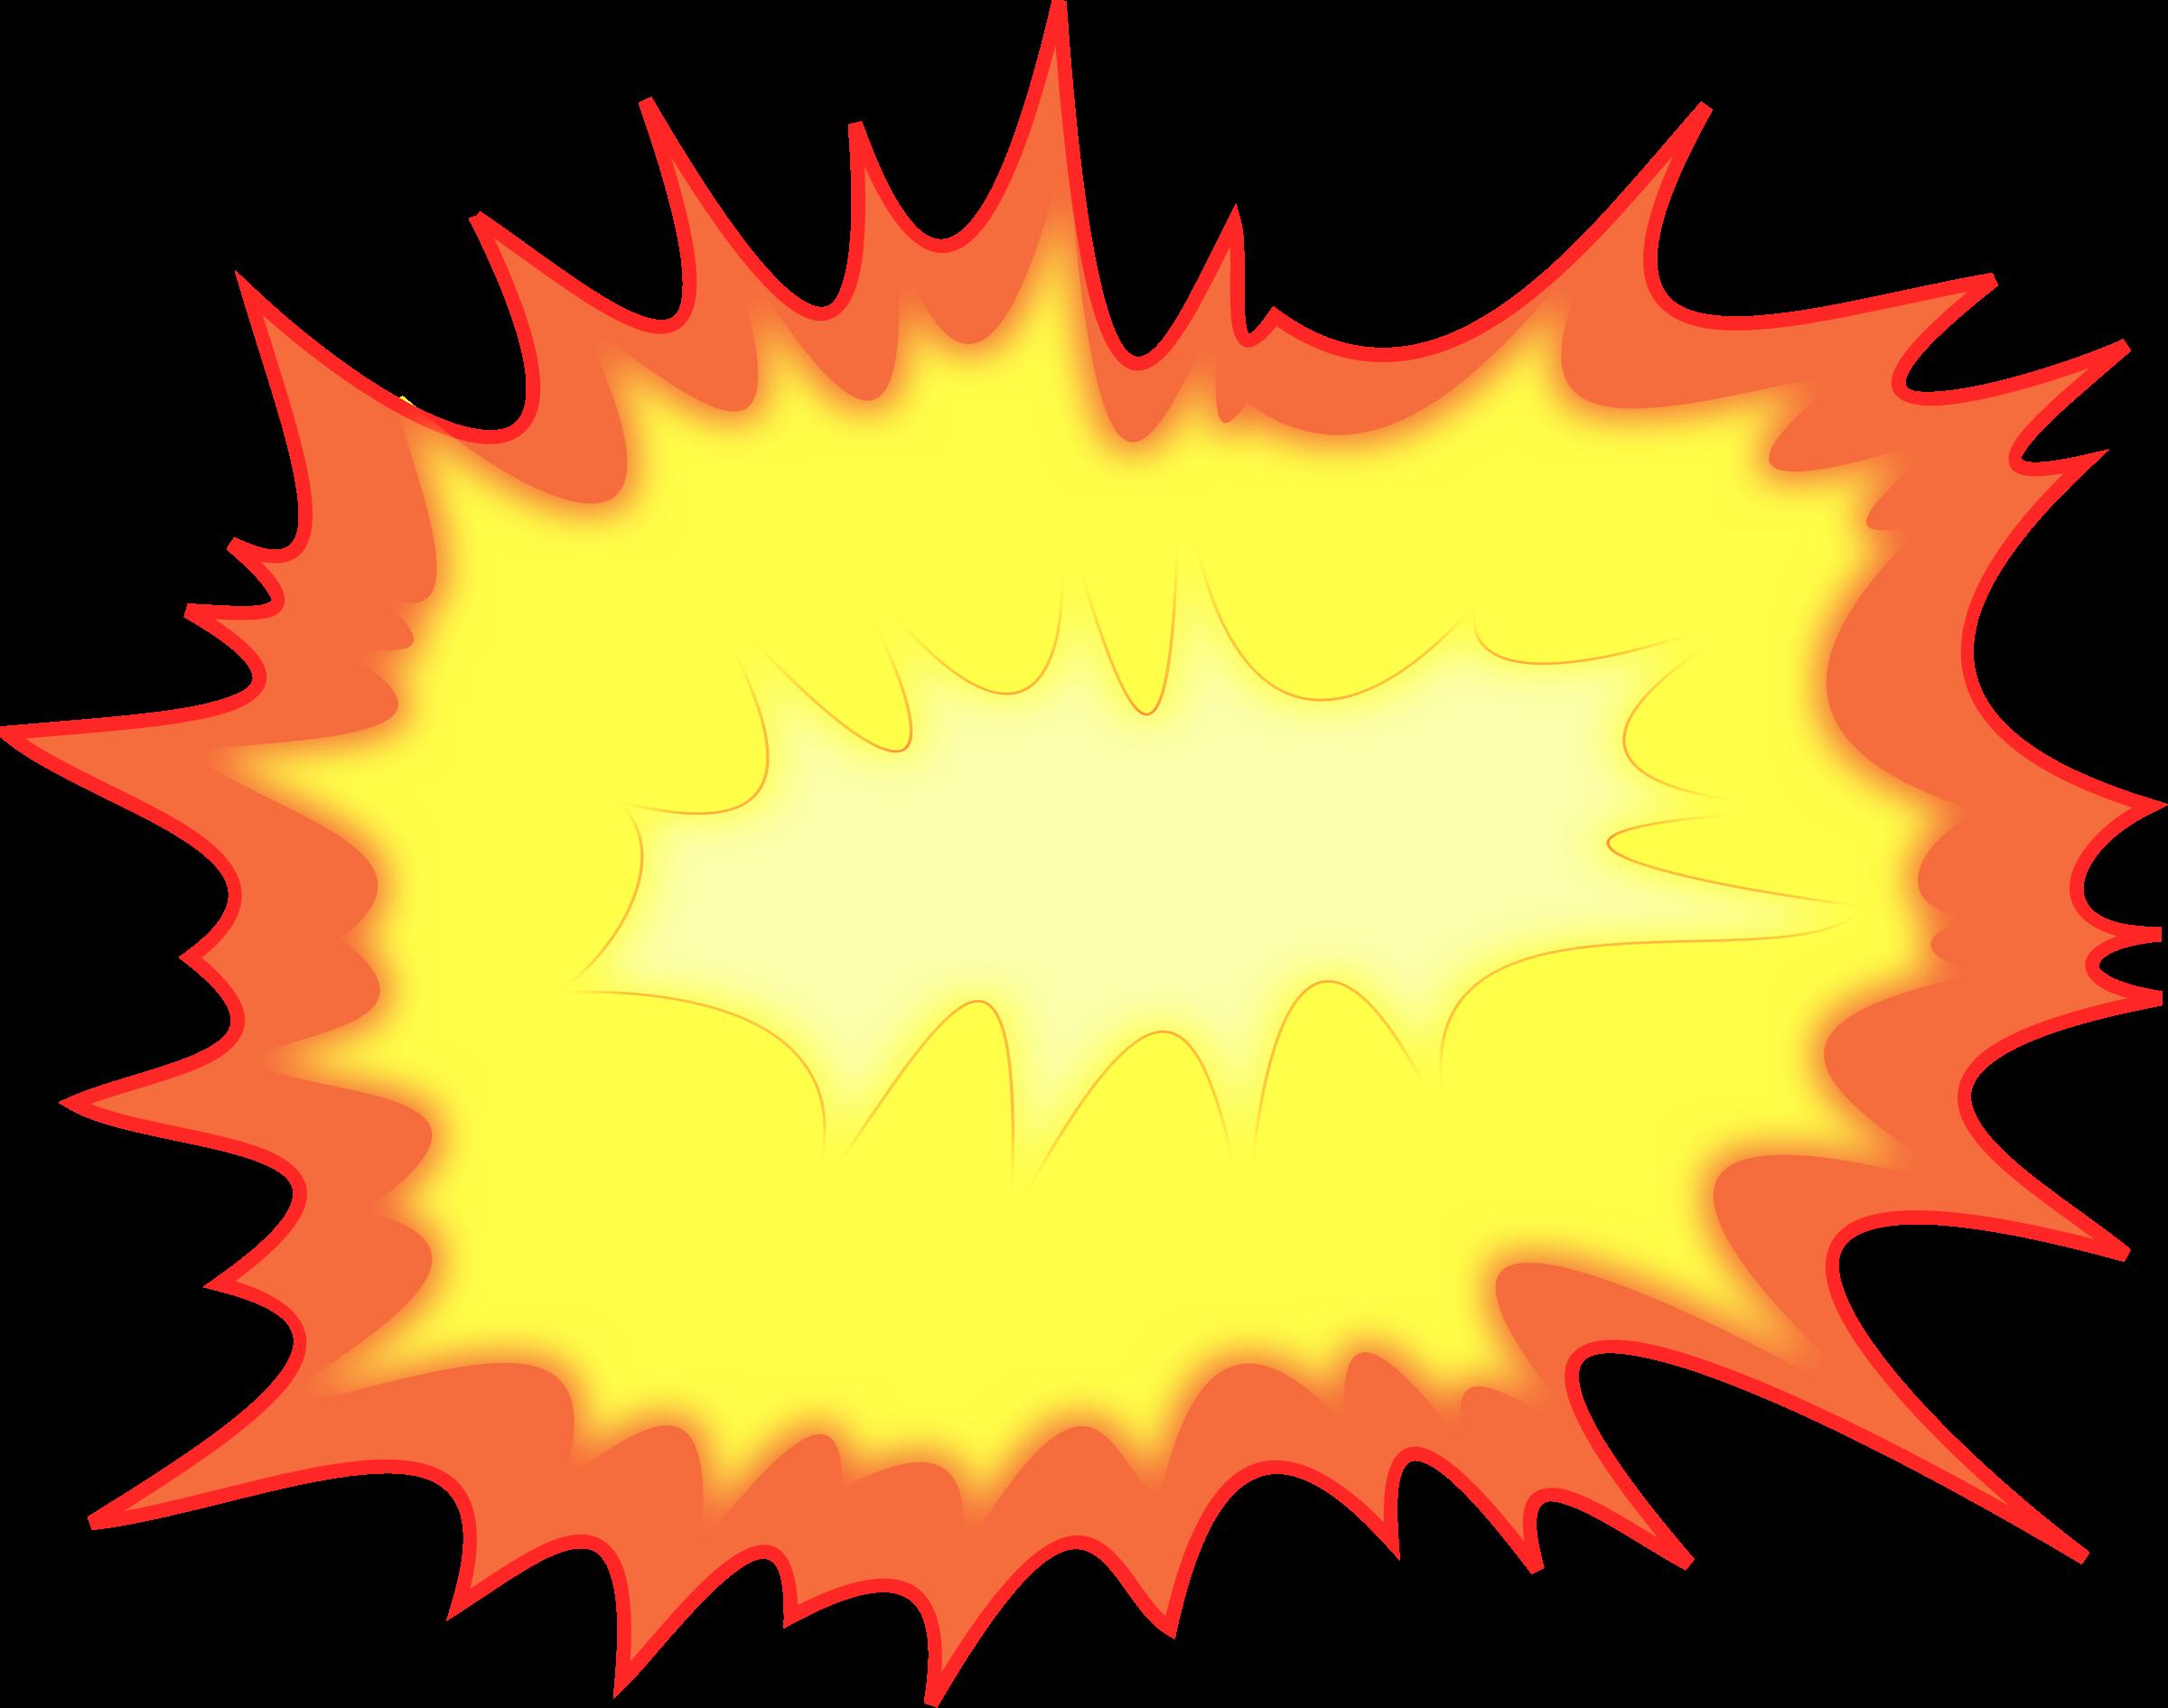 Explosion clipart lab explosion, Explosion lab explosion.